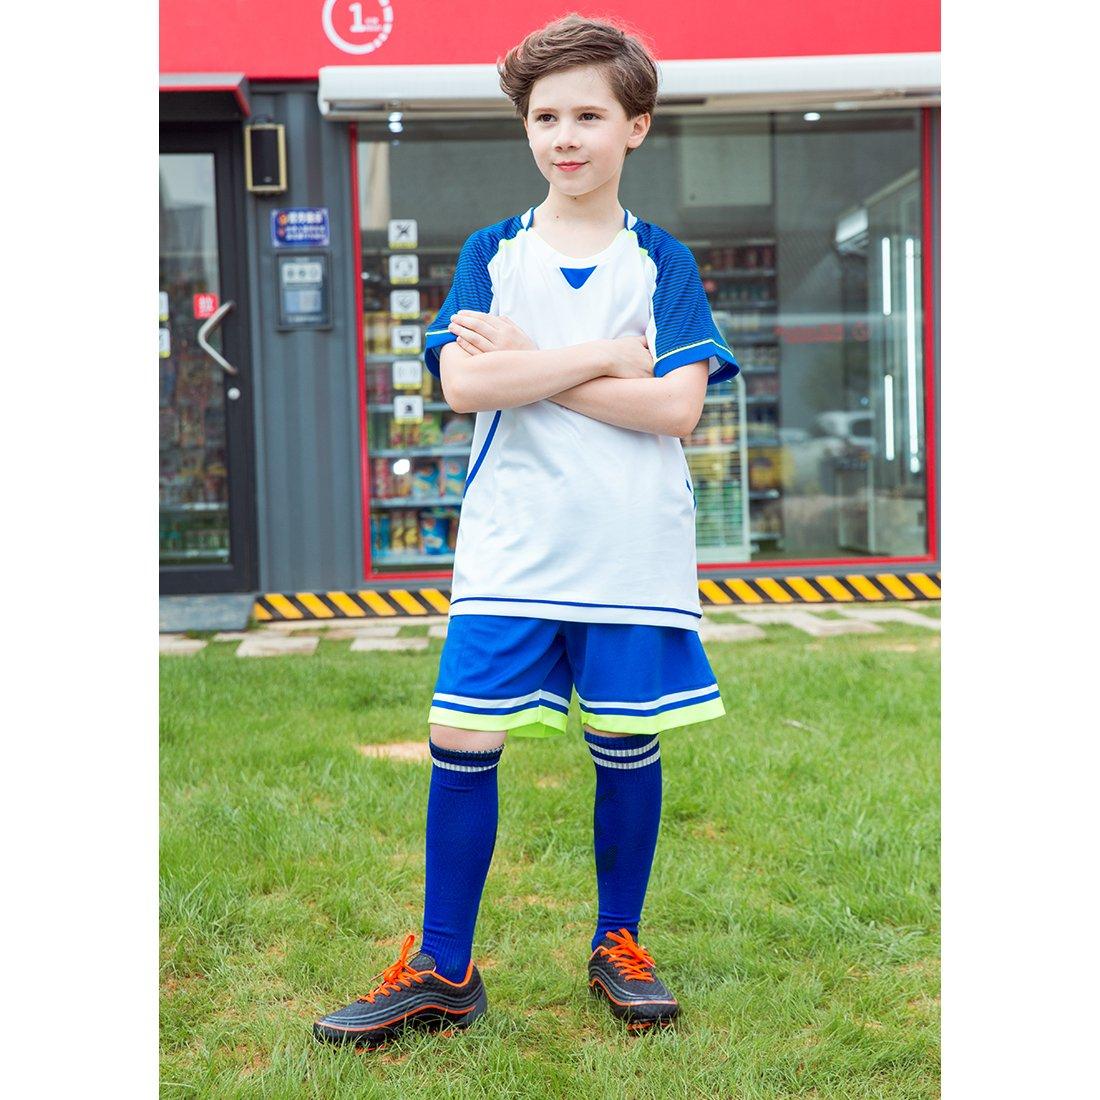 30832cace509 Galleon - Hawkwell Athletic Outdoor/Indoor Comfortable Soccer Shoes(Toddler/Little  Kid/Big Kid) (12M US Little Kid, Black/Orange-1)